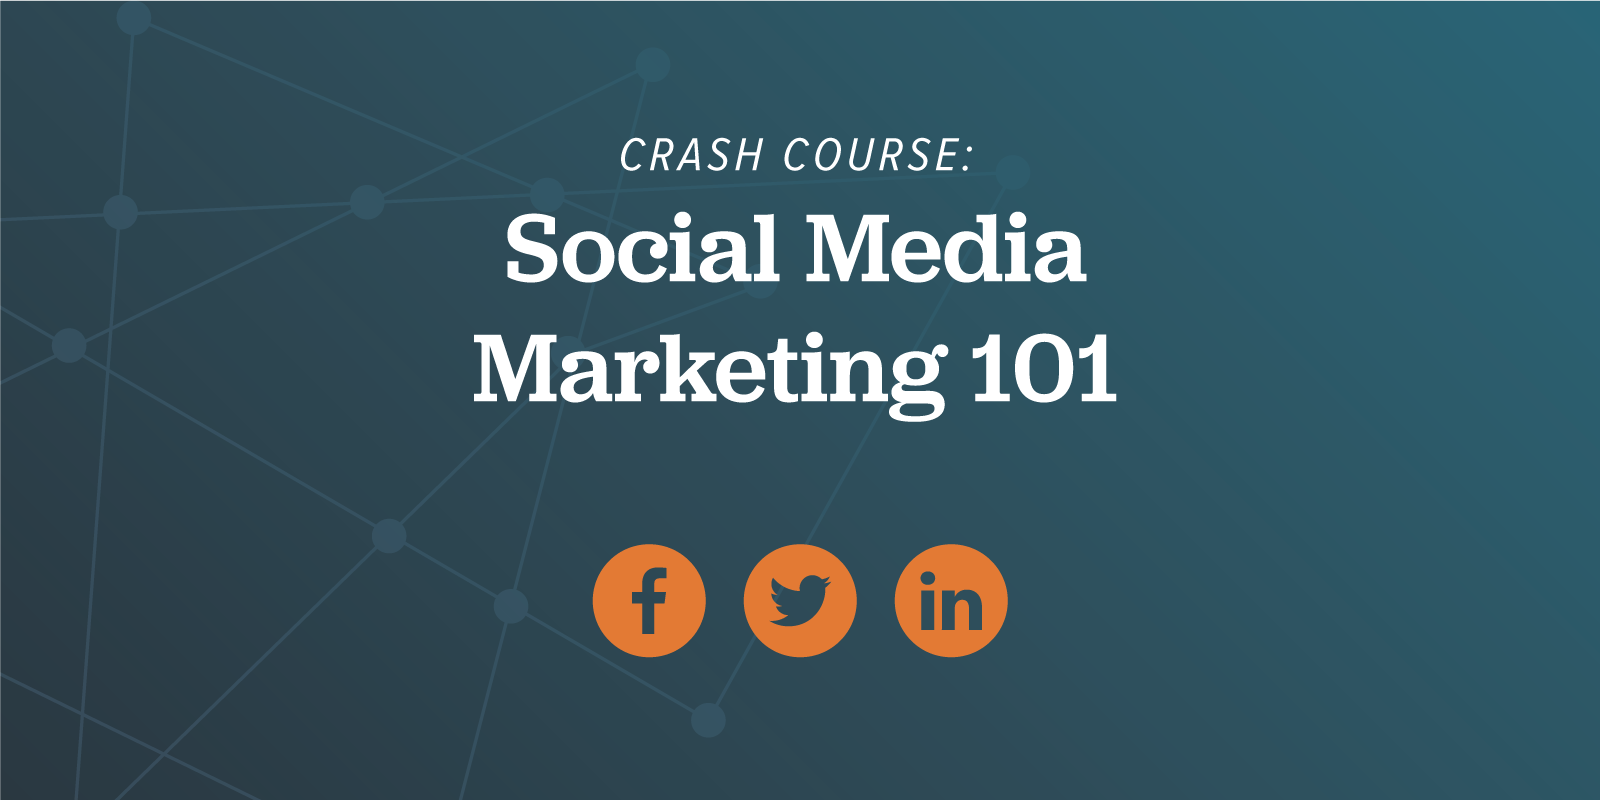 ArcStone Crash Course: Social Media Marketing 101